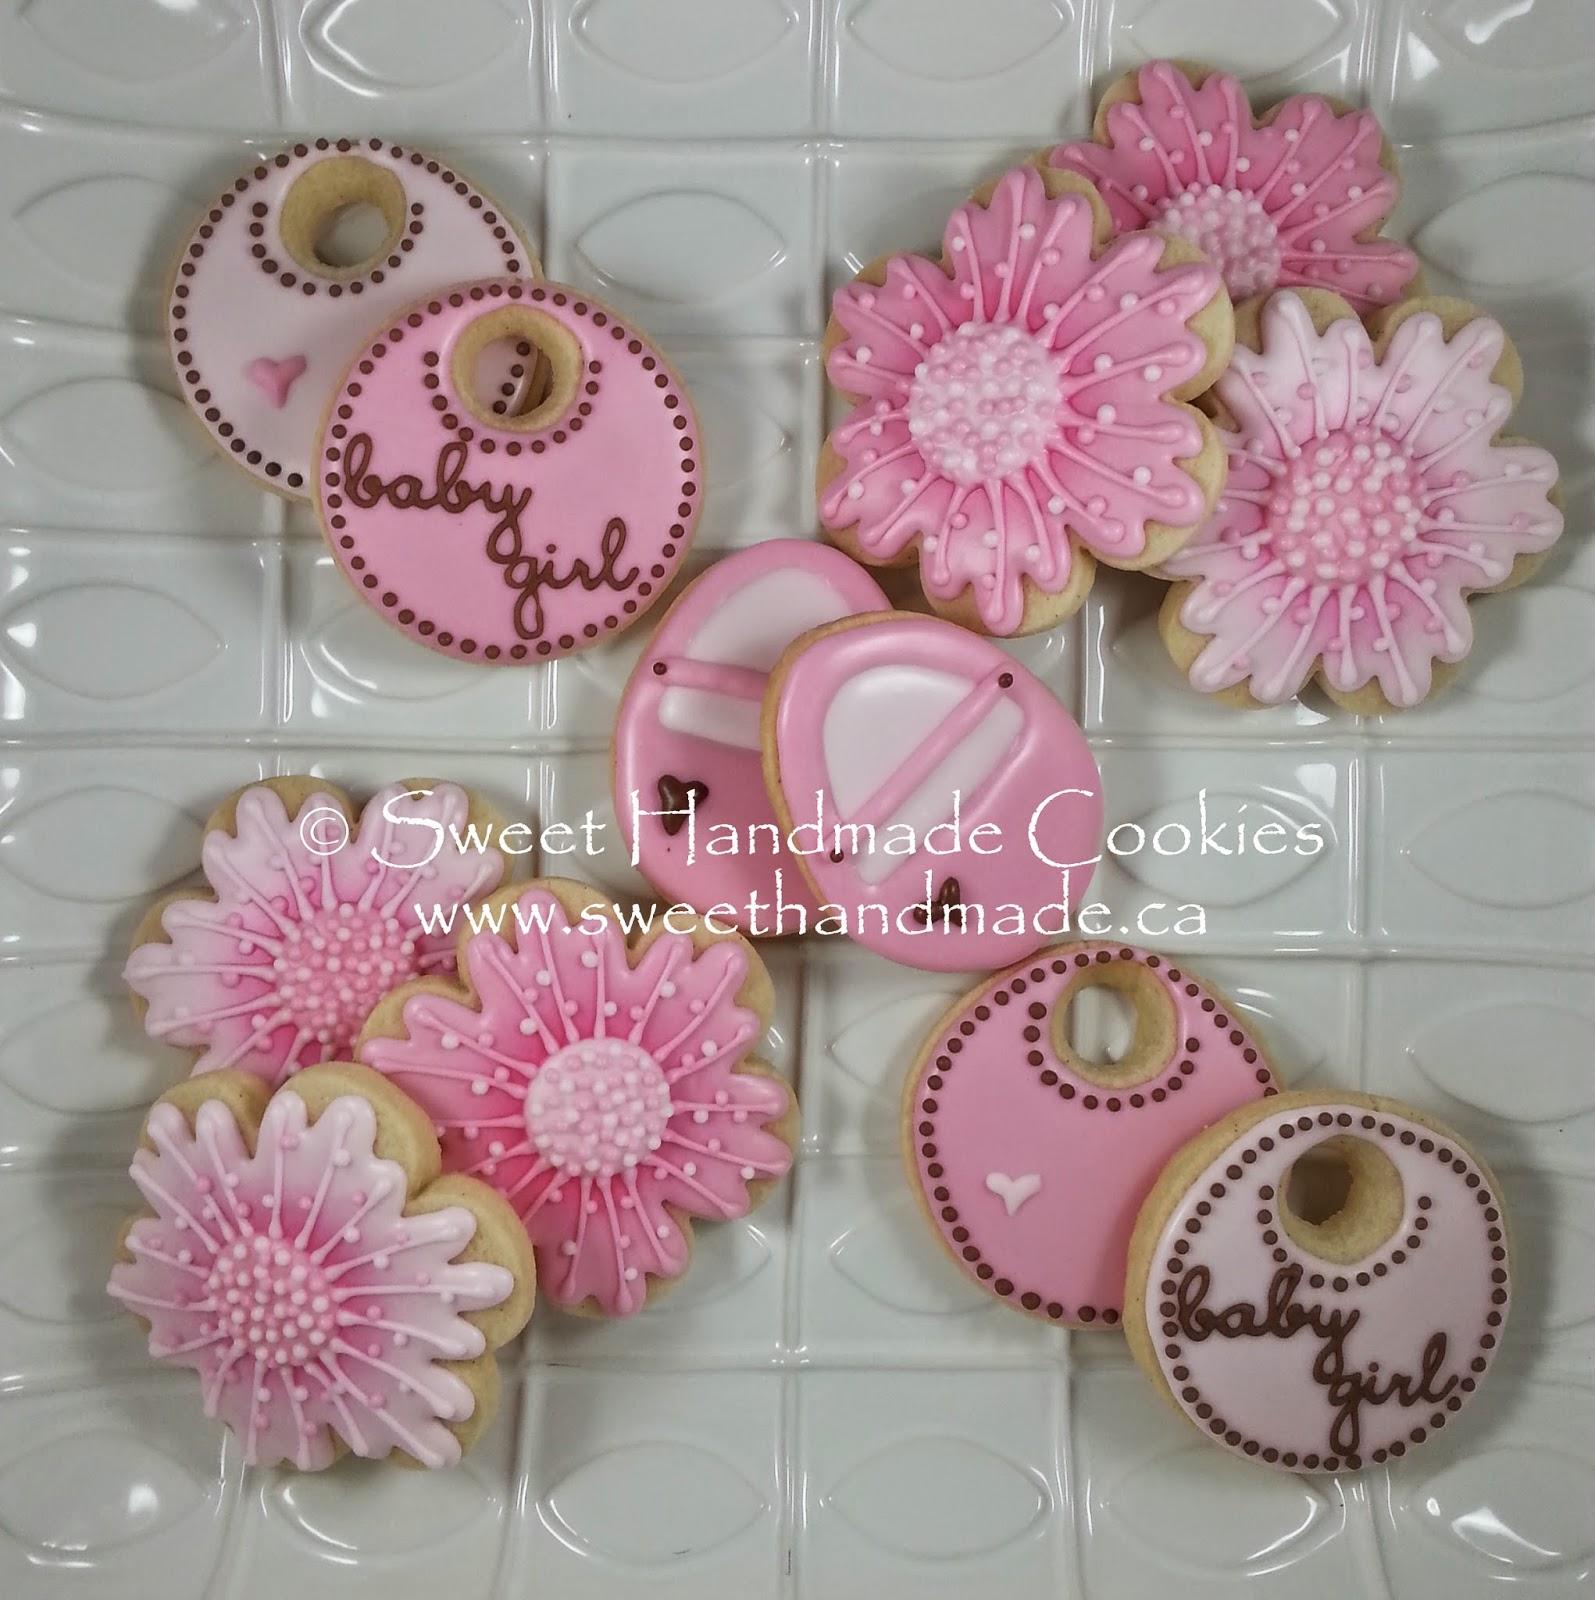 Sweet Handmade Cookies Baby Shower Cookies For A Girl